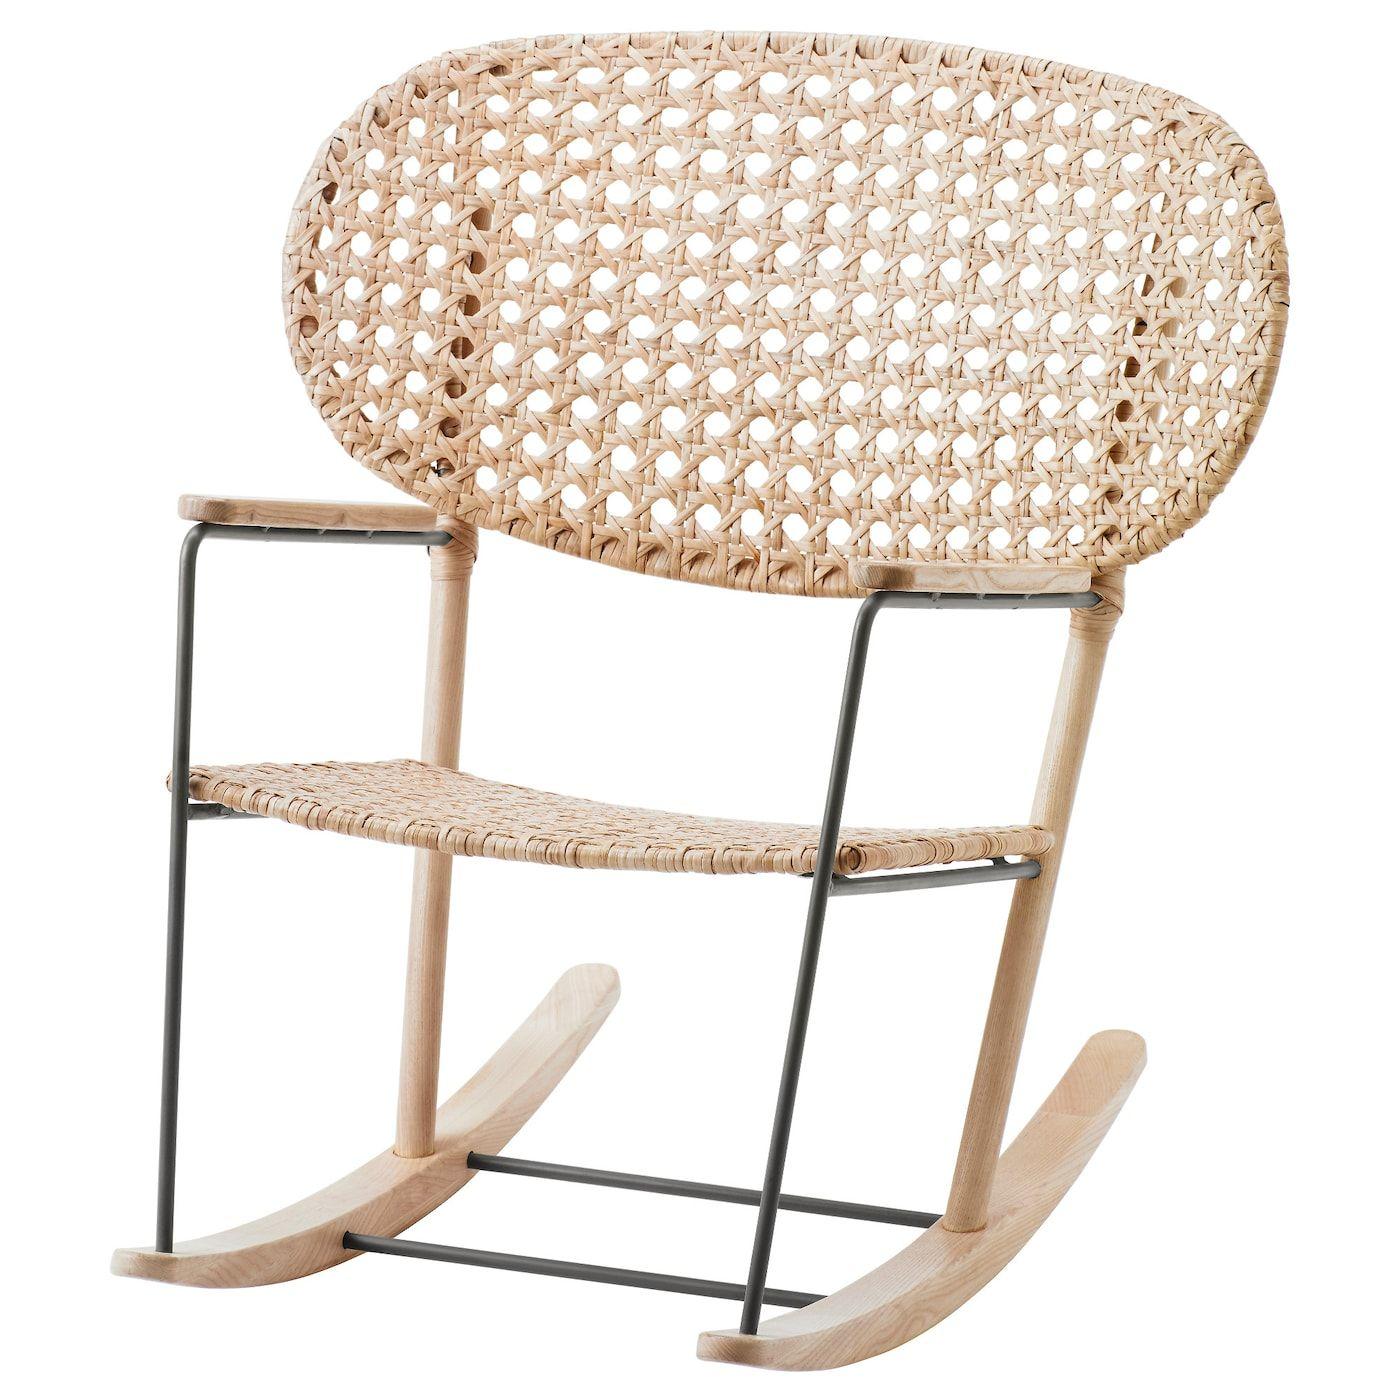 Grönadal Keinutuoli Harmaa Luonnonvärinen Ikea Ikea Finds Rocking Chair Ikea Living Room Furniture